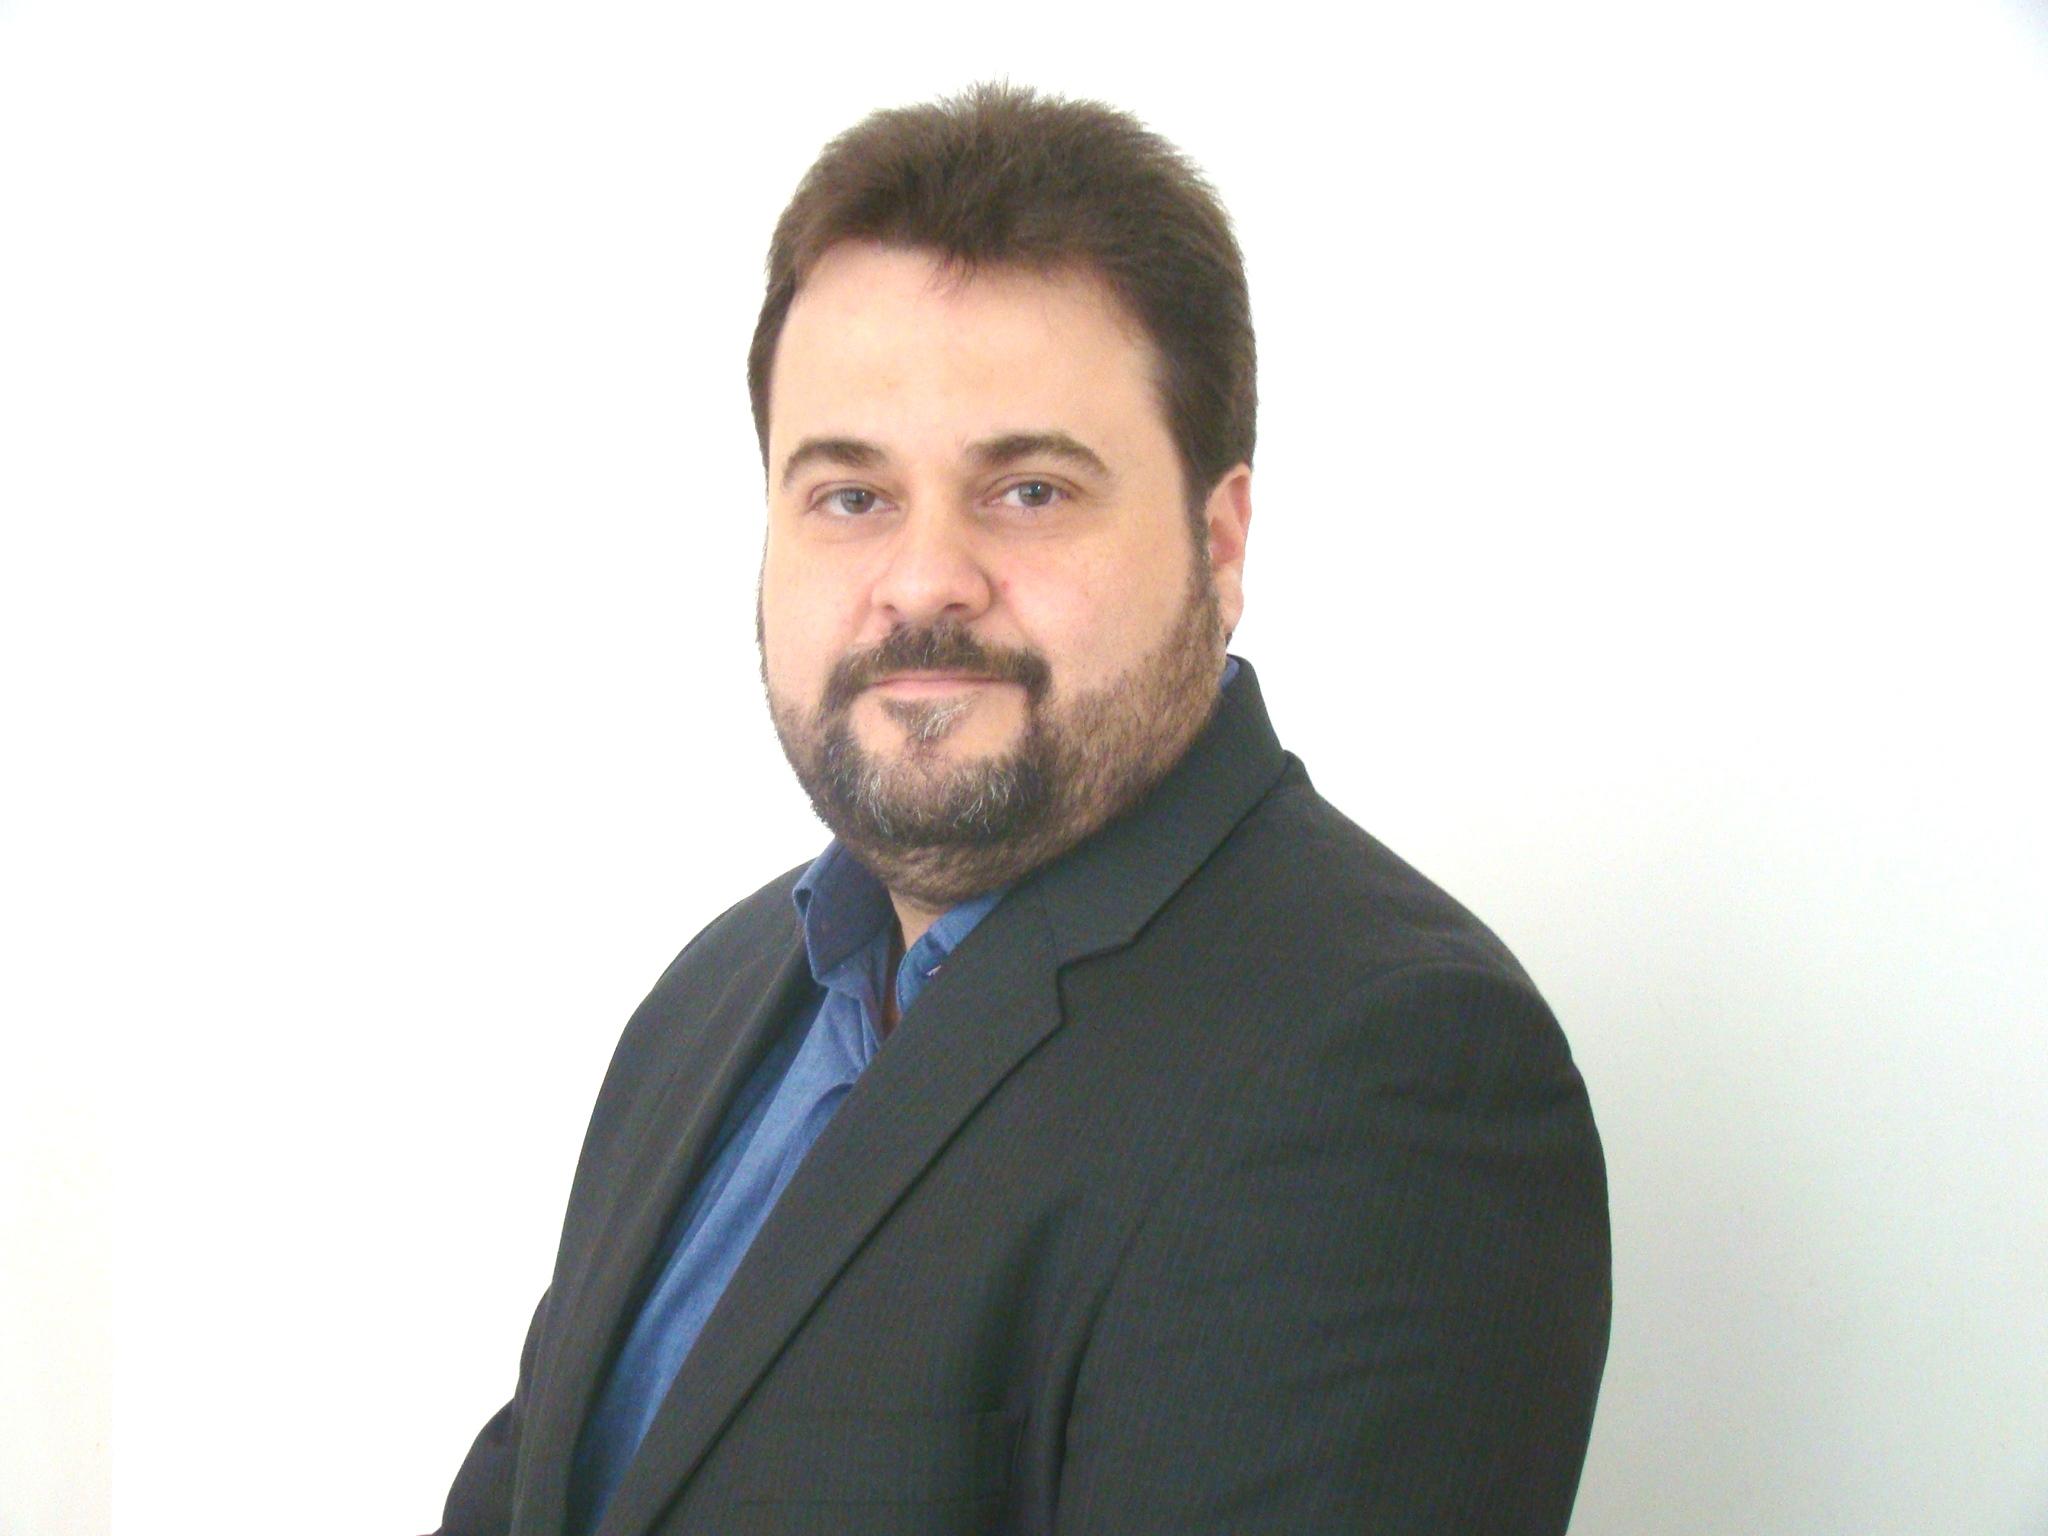 Leandro Barbeita